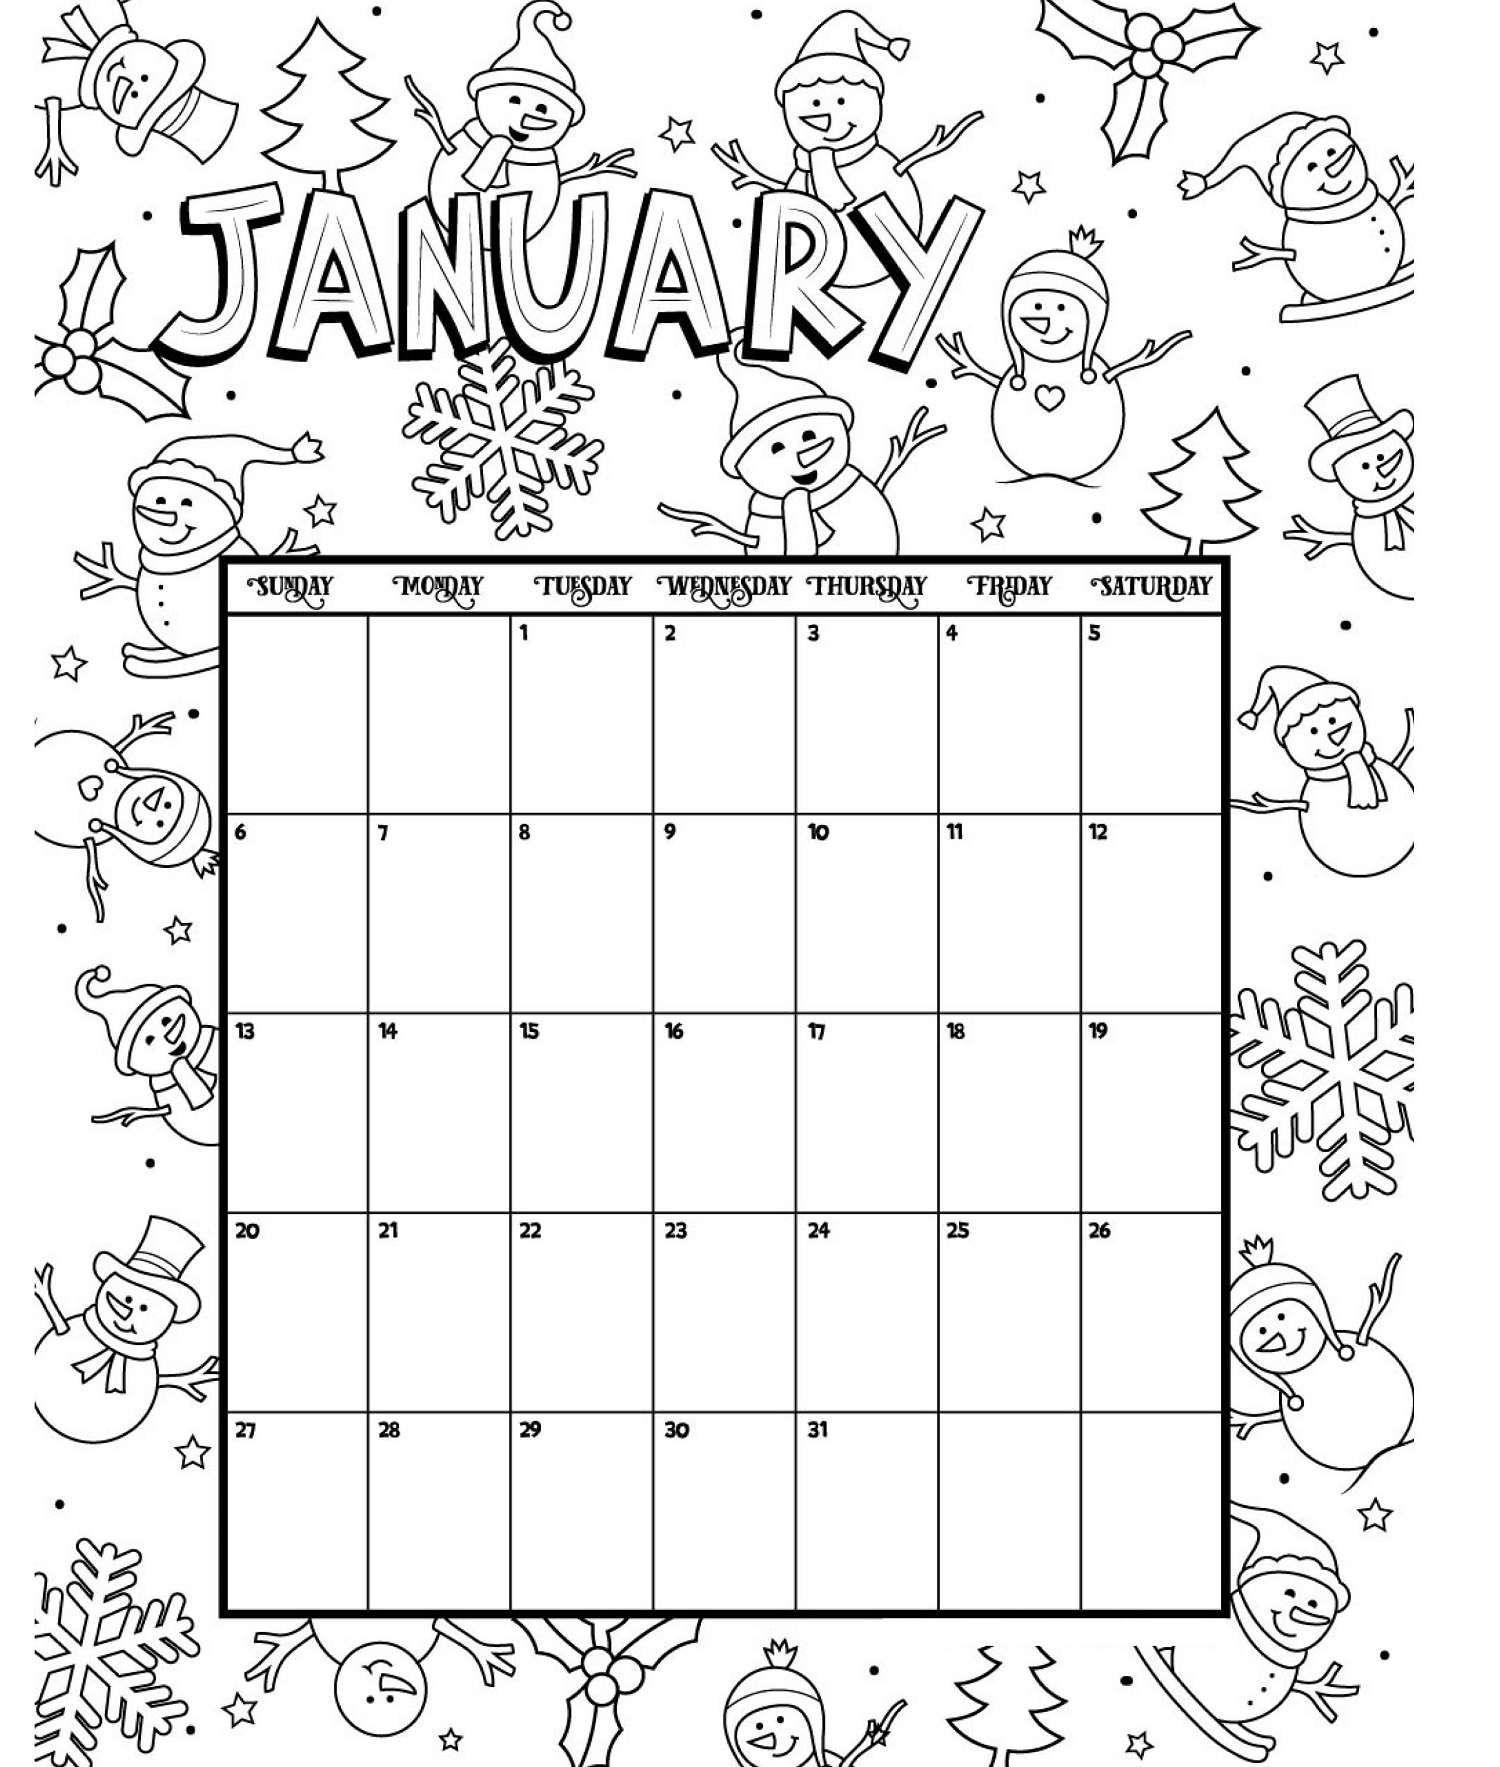 January Printable Coloring Calendar 2019   Coloring Calendar